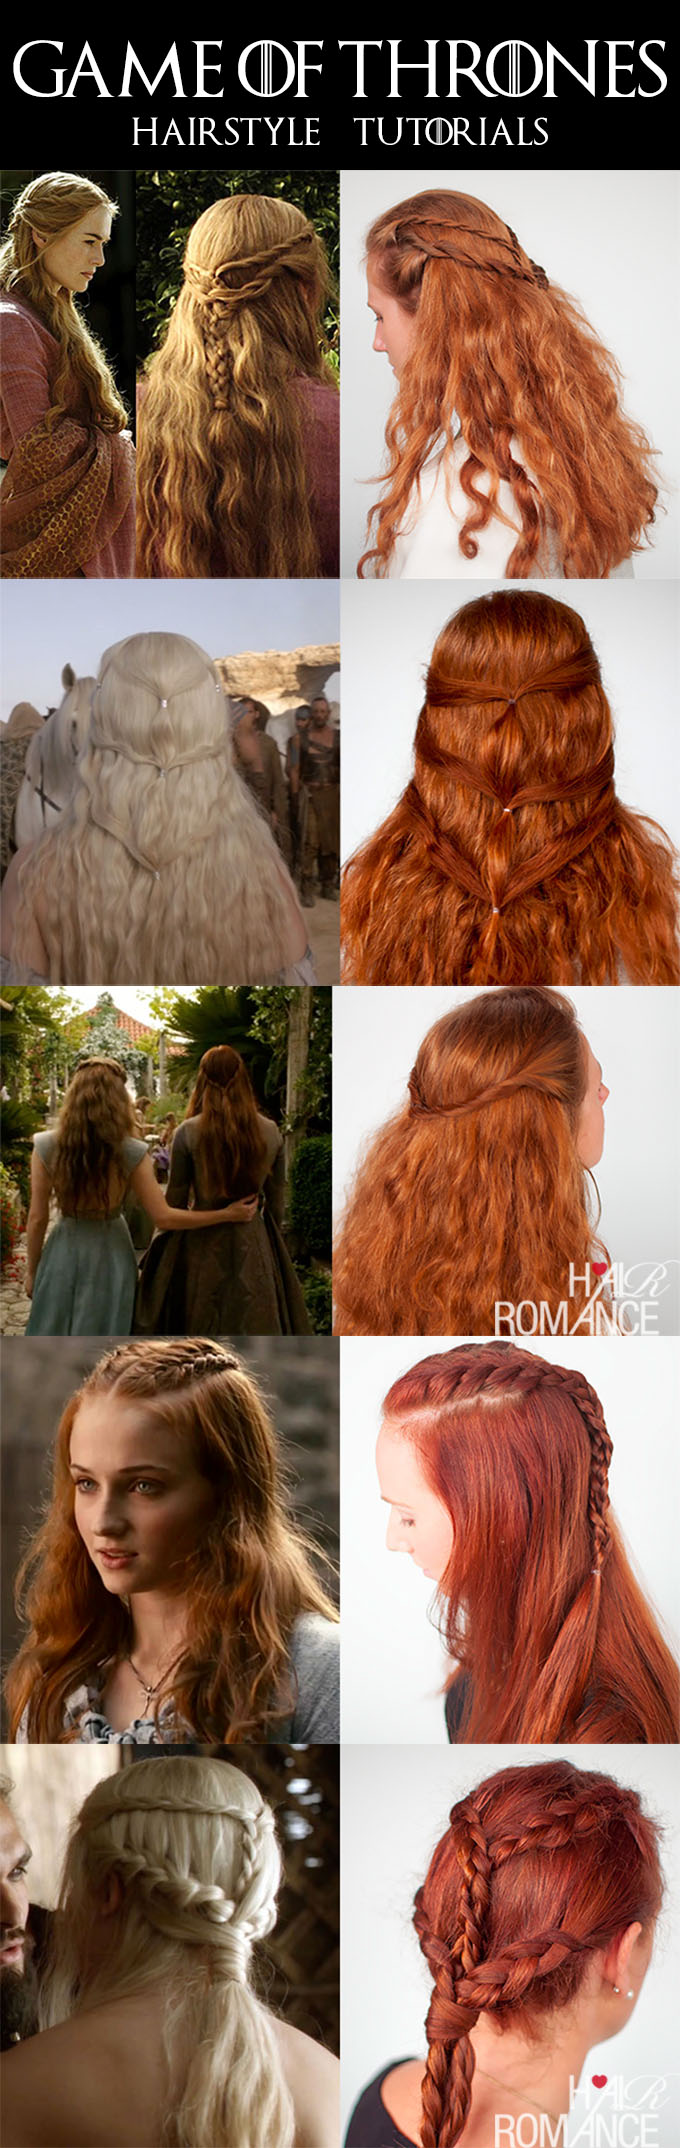 Hair Romance - Halloween hairstyles - Game of Thrones Hair tutorials